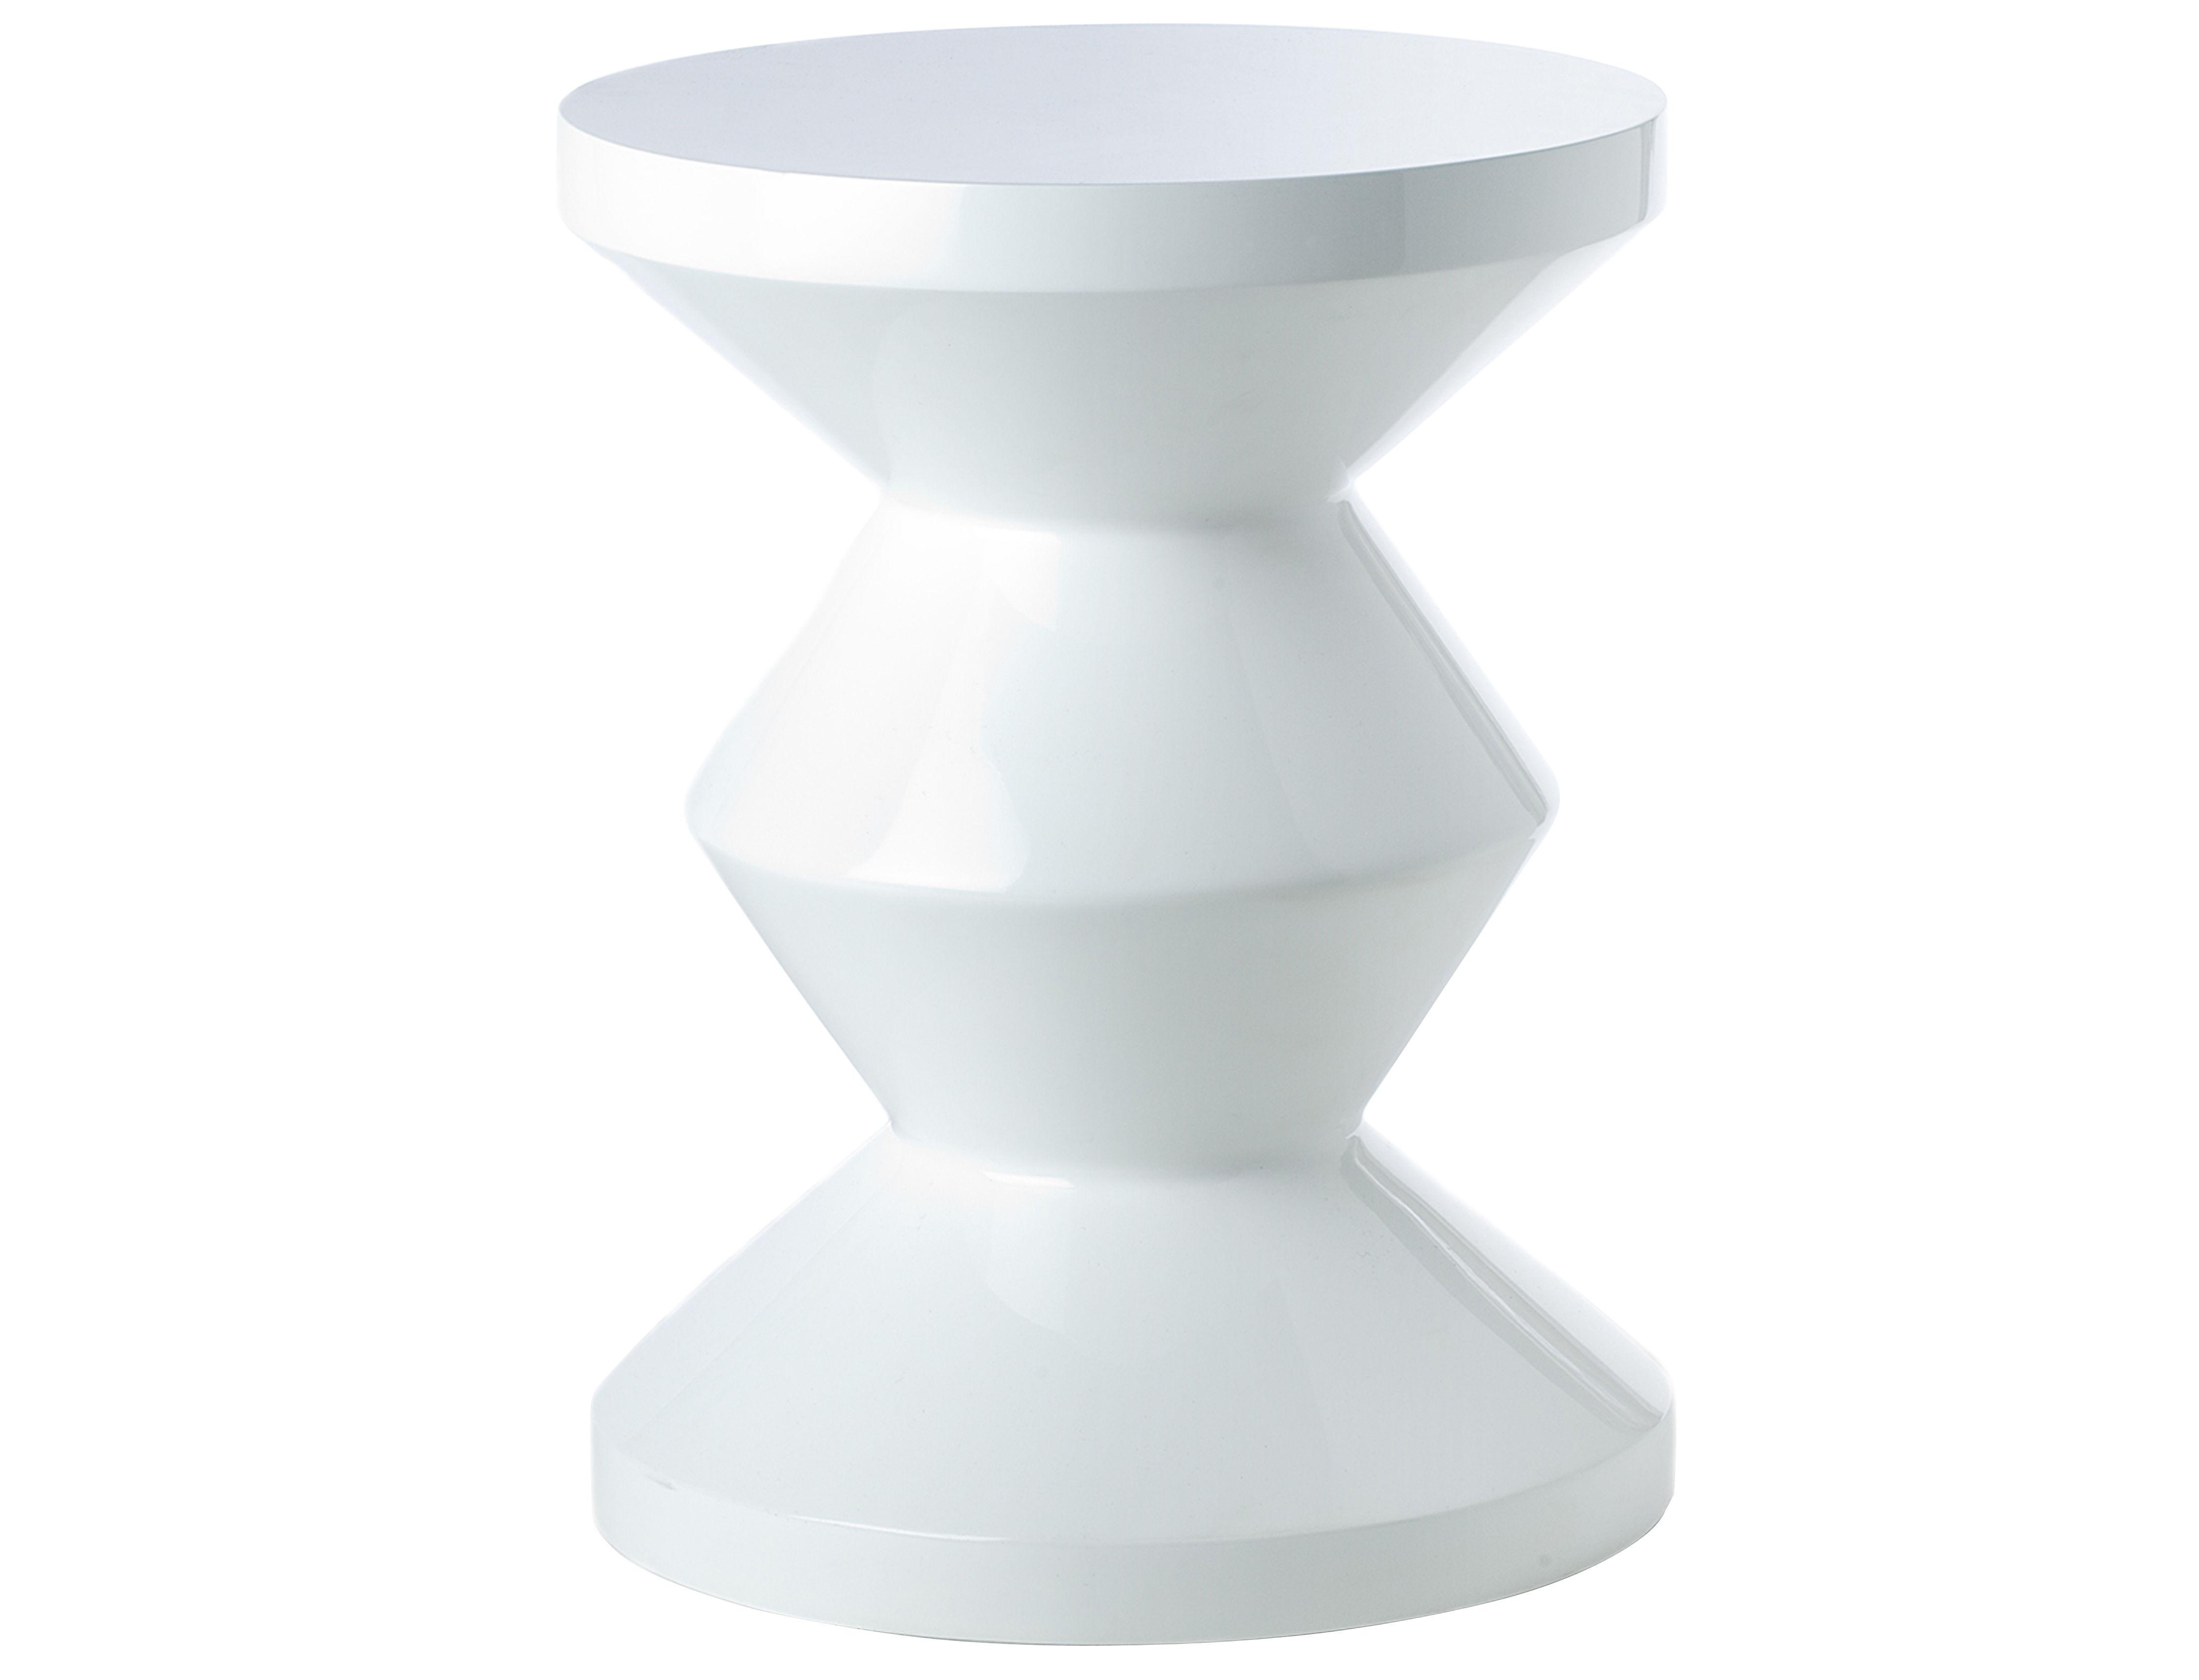 Möbel - Hocker - Zig Zag Hocker - Pols Potten - Weiß - lackiertes Polyester